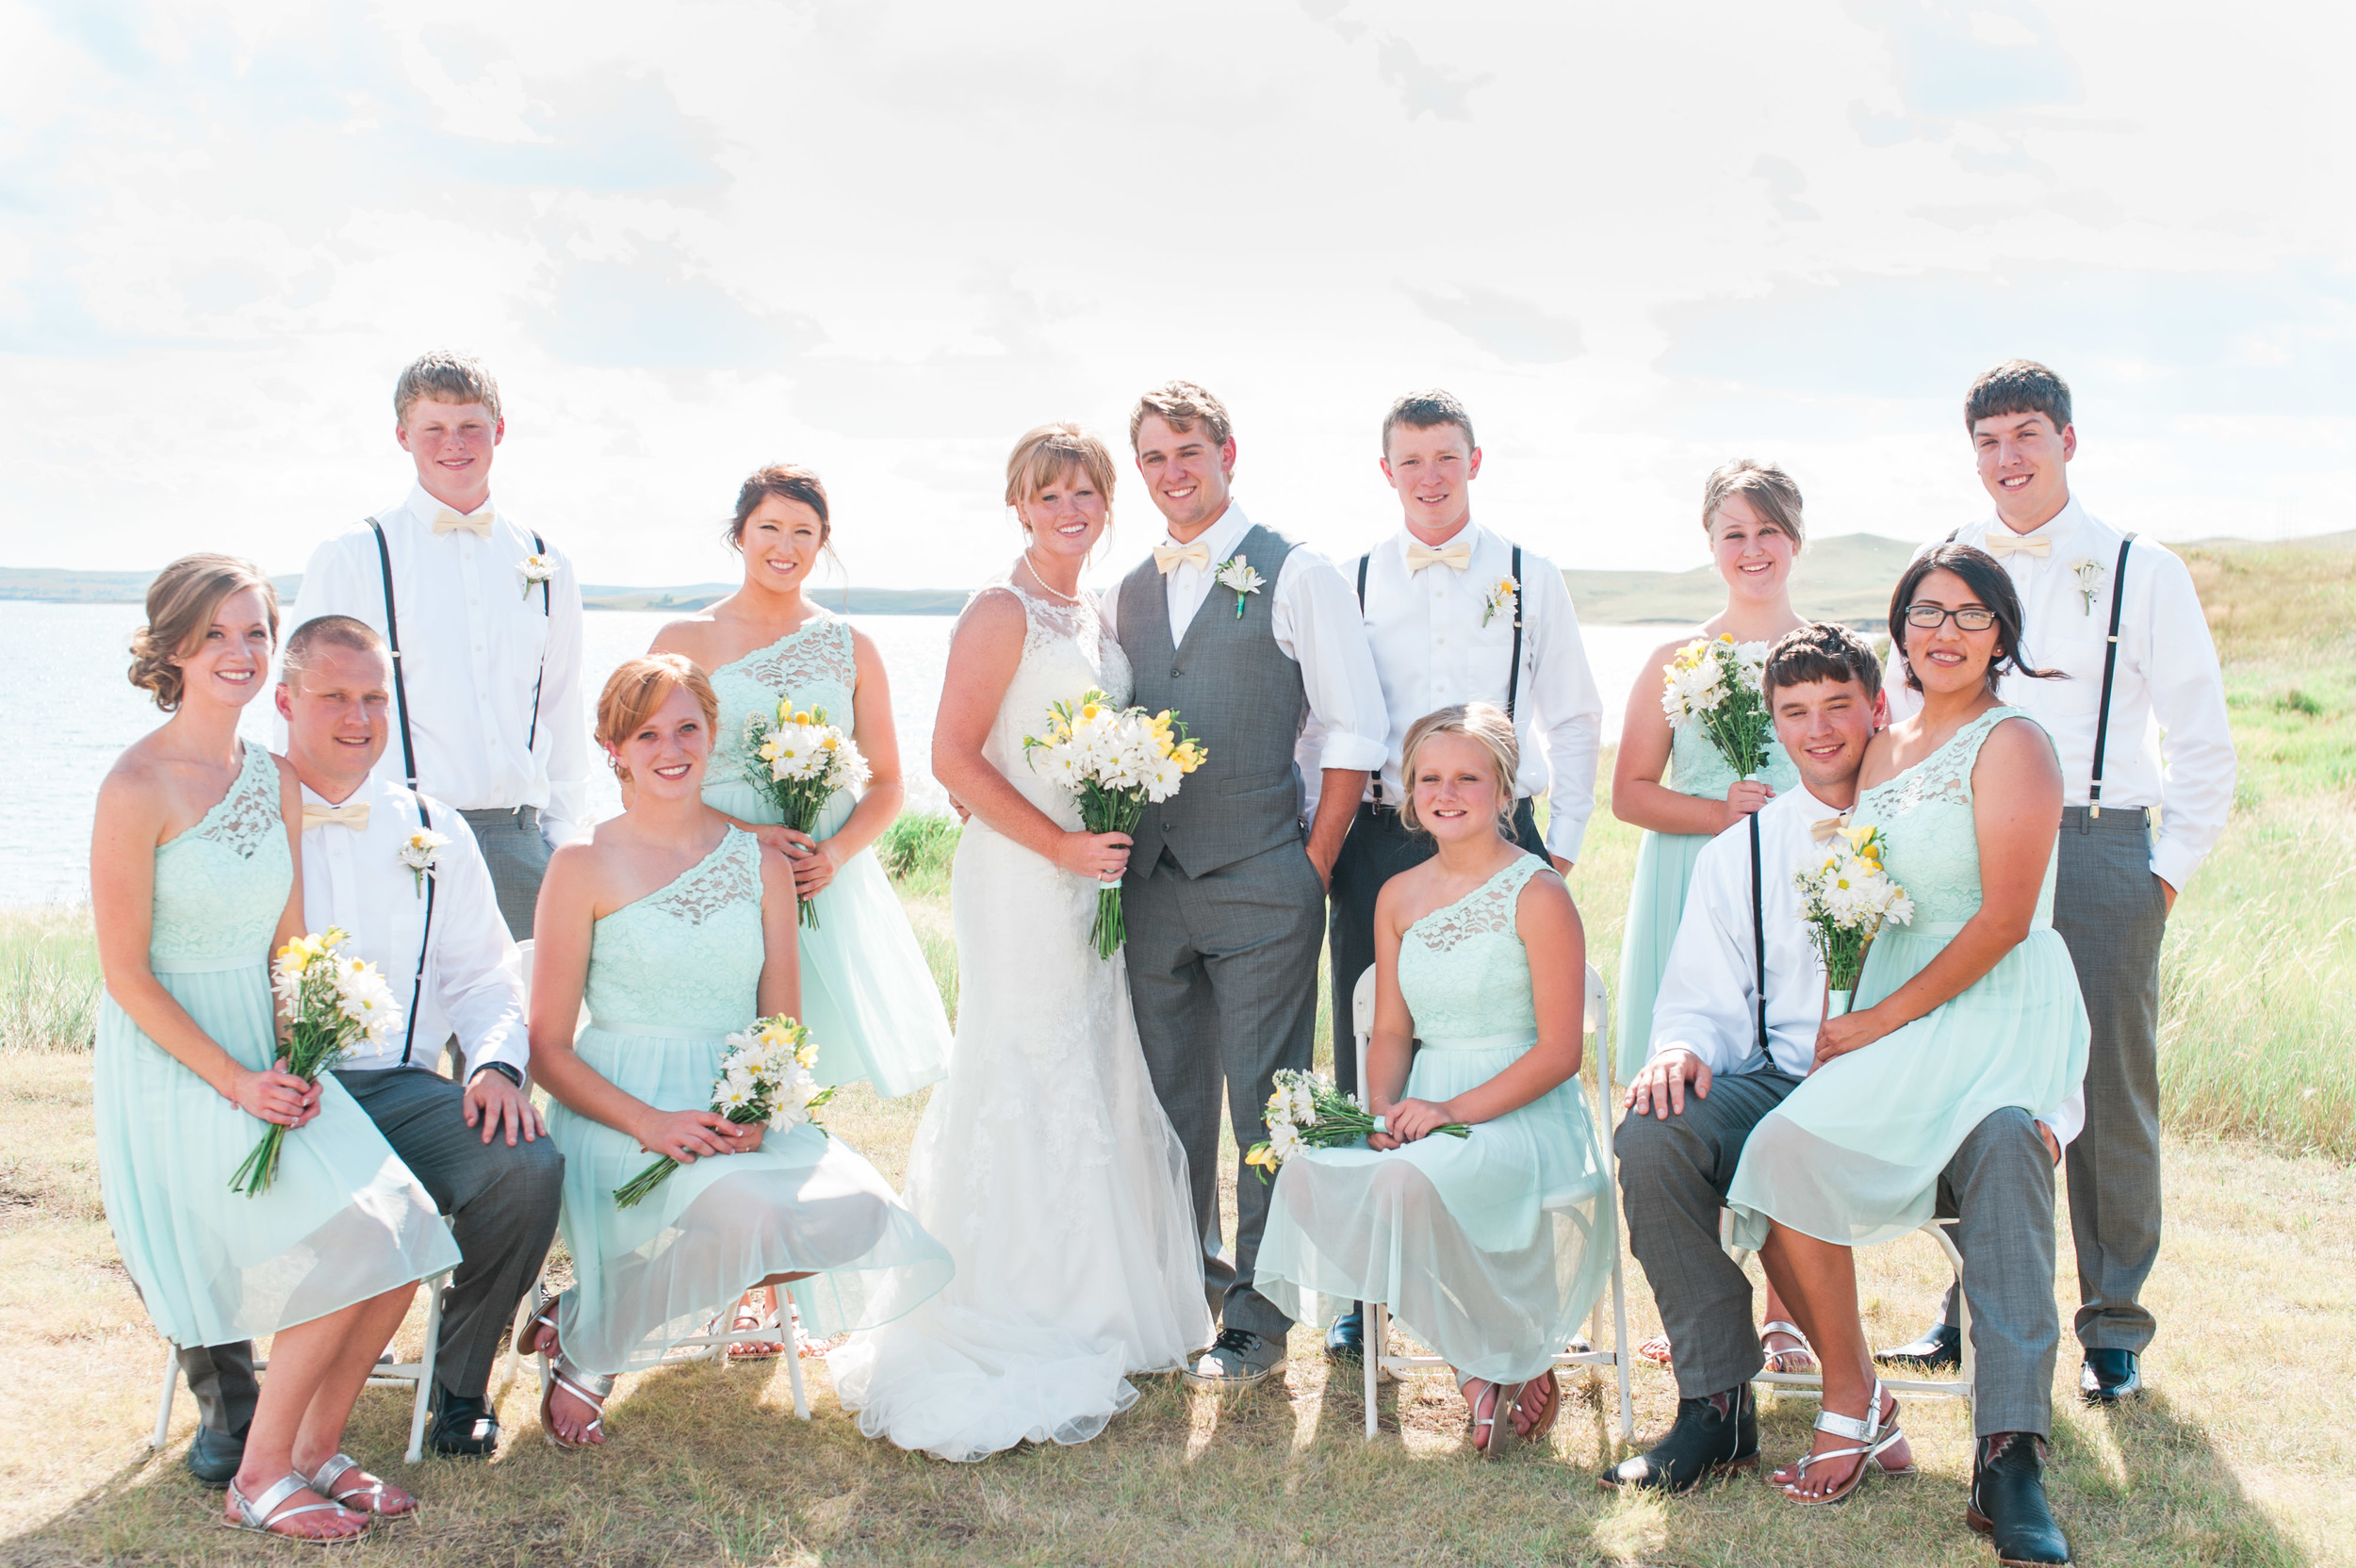 wedding-photography-22.jpg